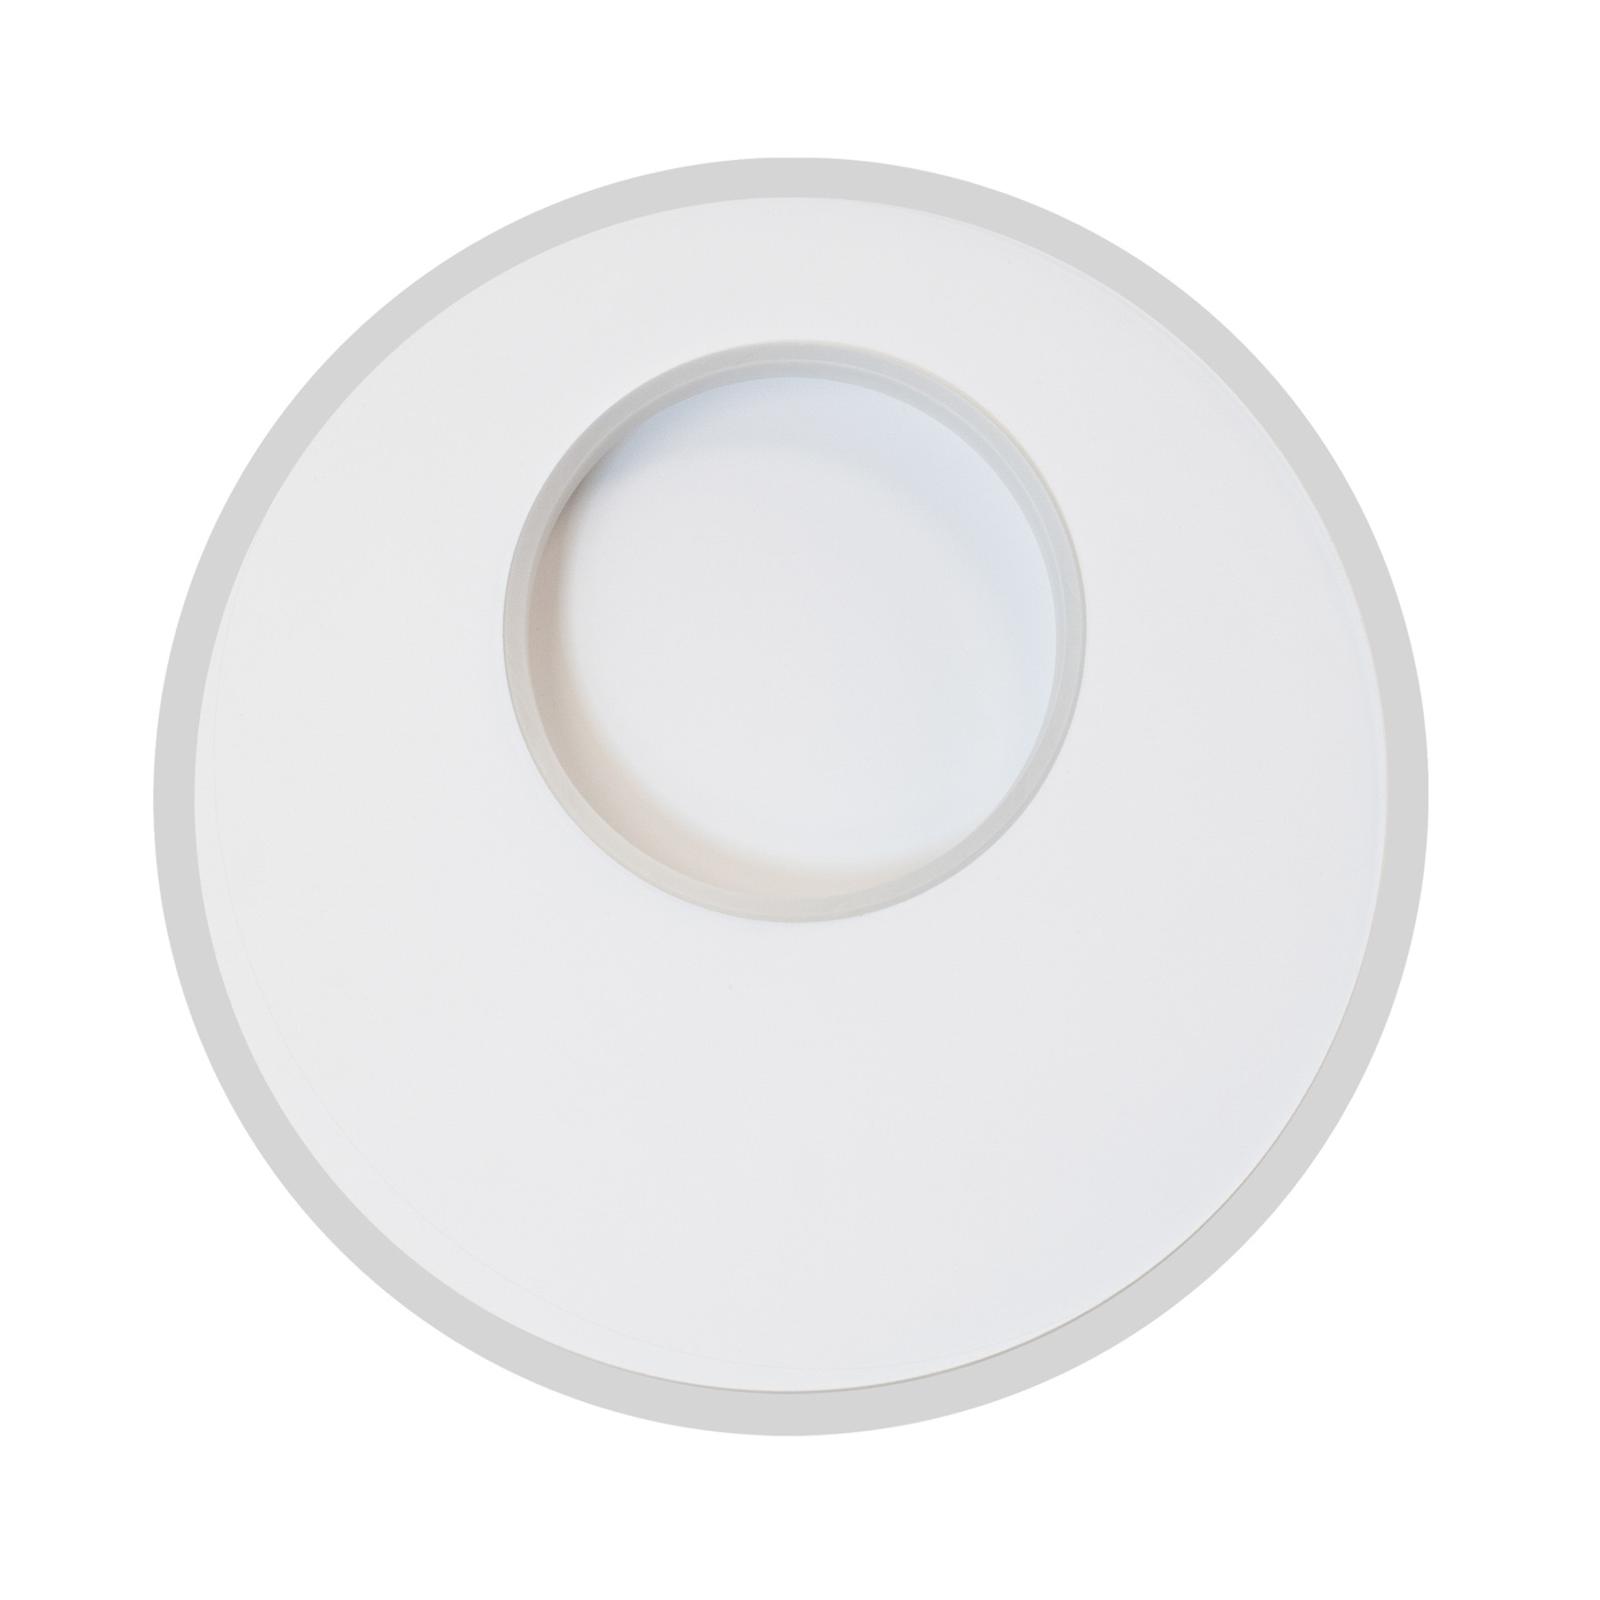 Lampa sufitowa LED Krater biała tunable white